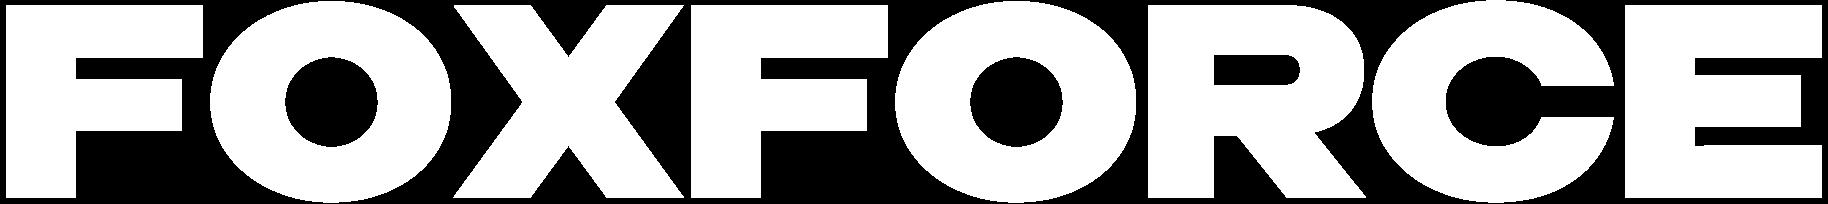 foxforce_logo